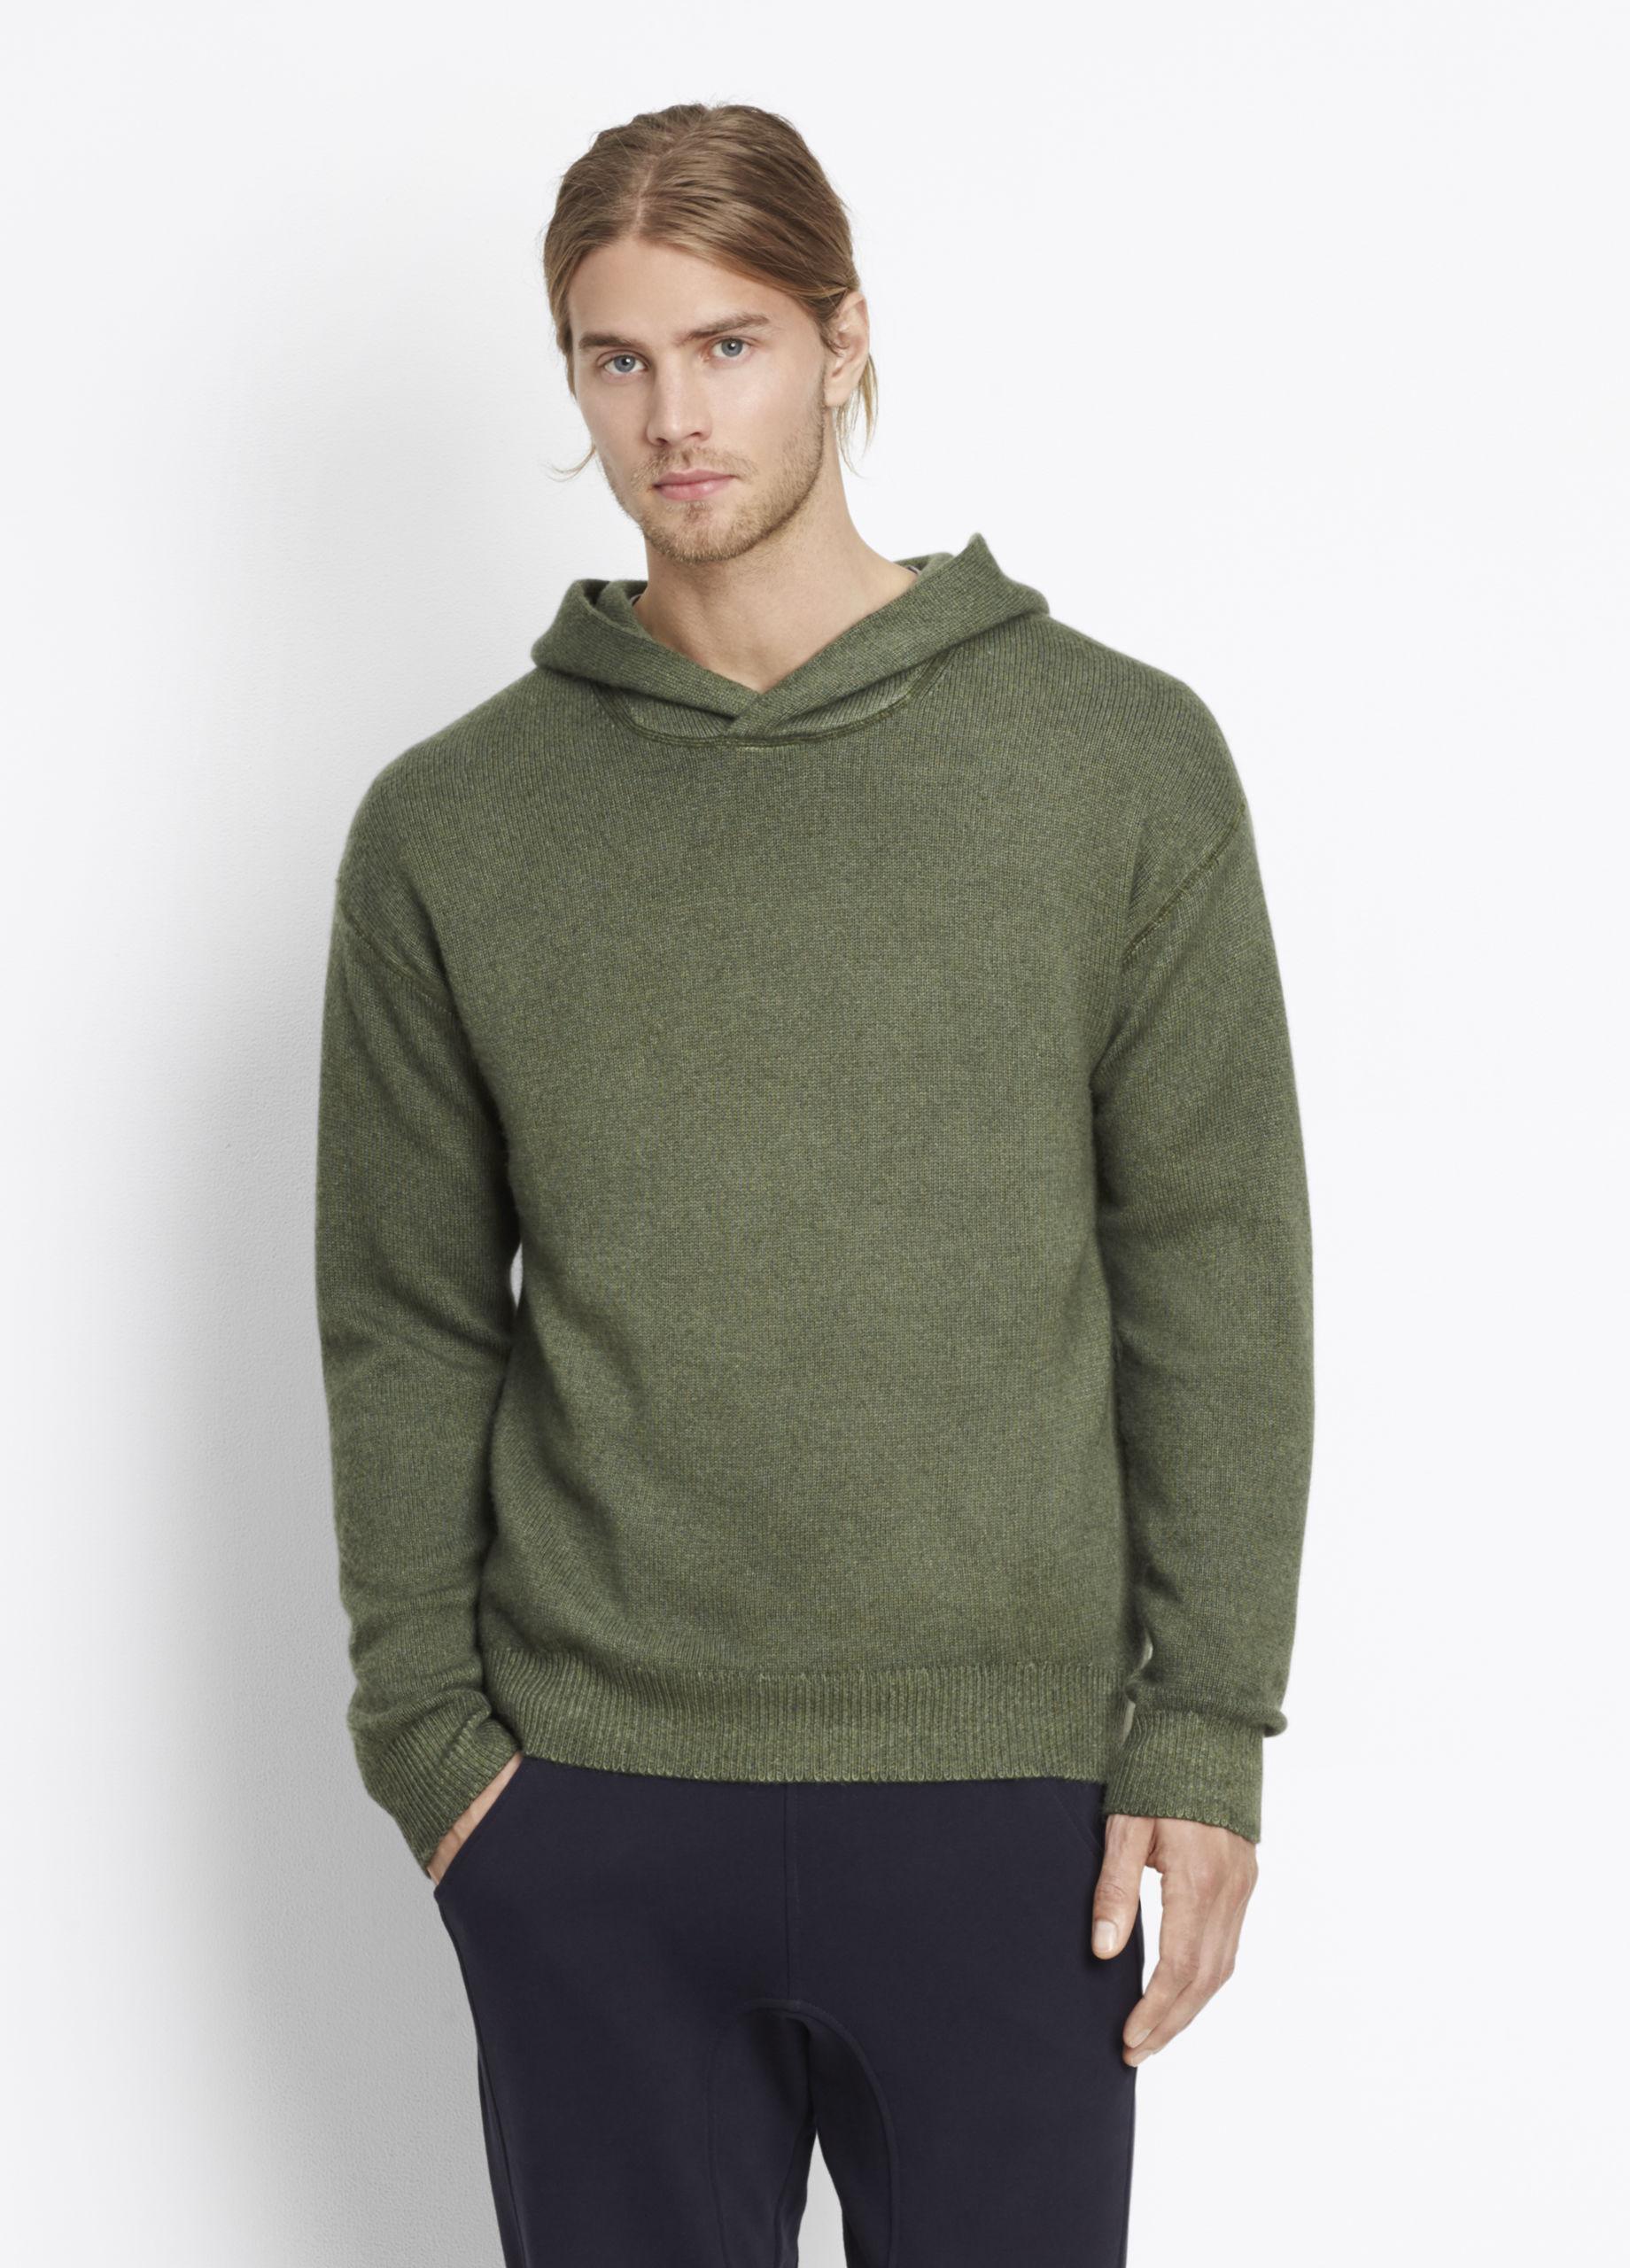 Green pullover hoodie